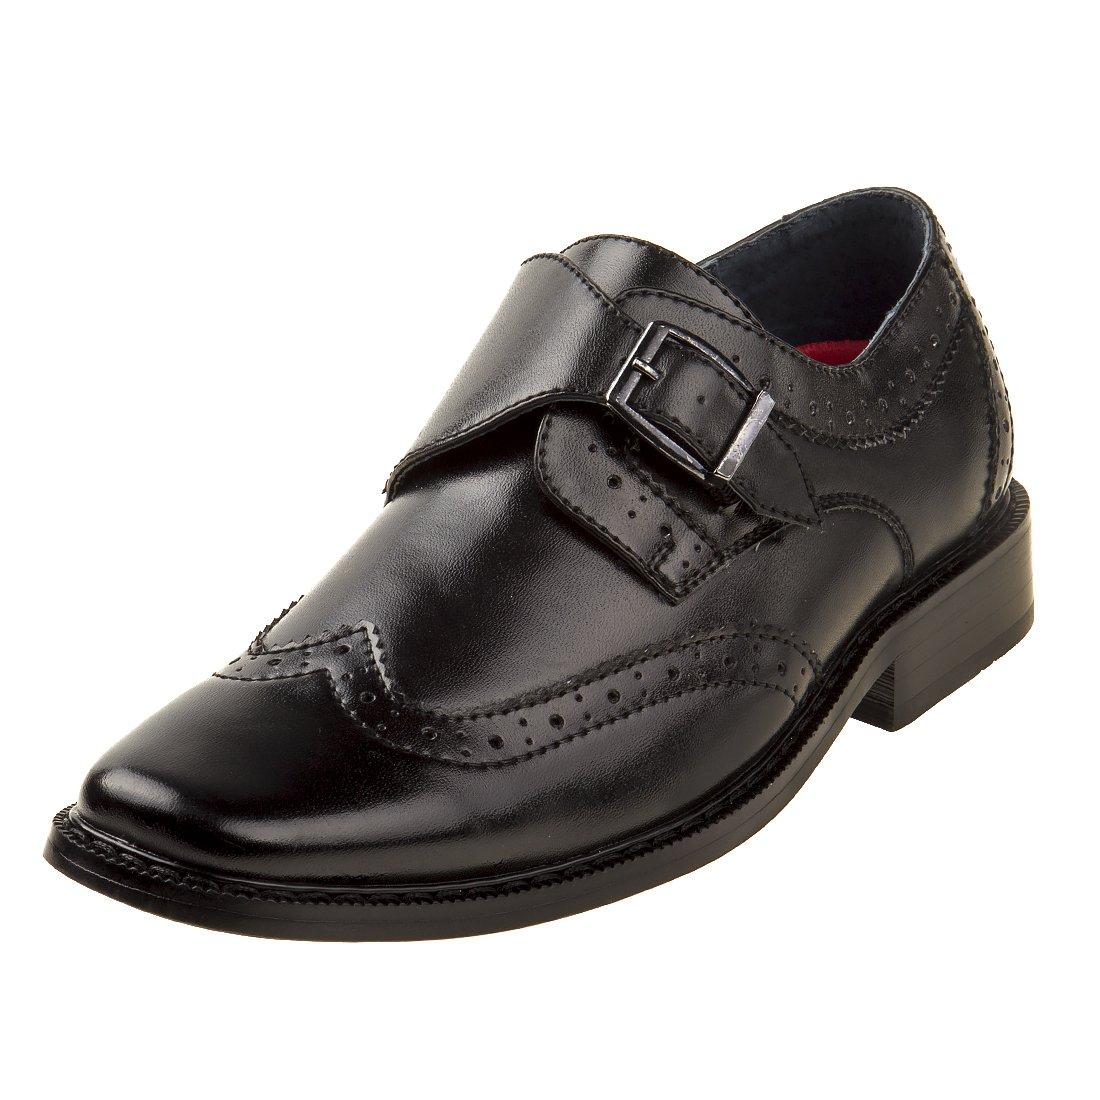 Joseph Allen Boy's Wingtip Shoe with Side Buckle, Black, 5 M US Toddler'